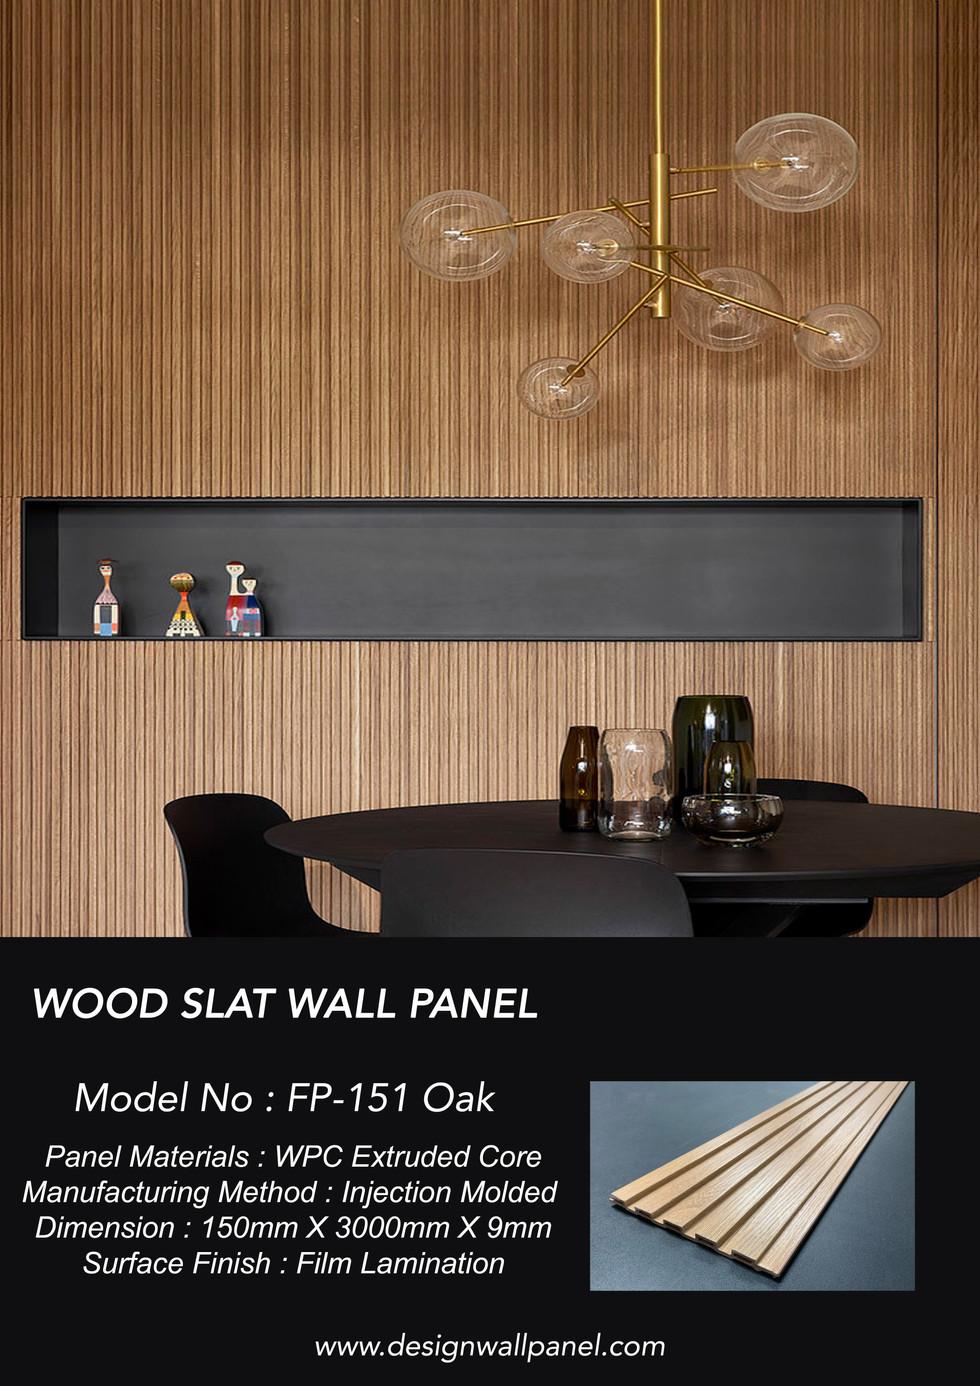 wood slat wall panel OAK .jpg